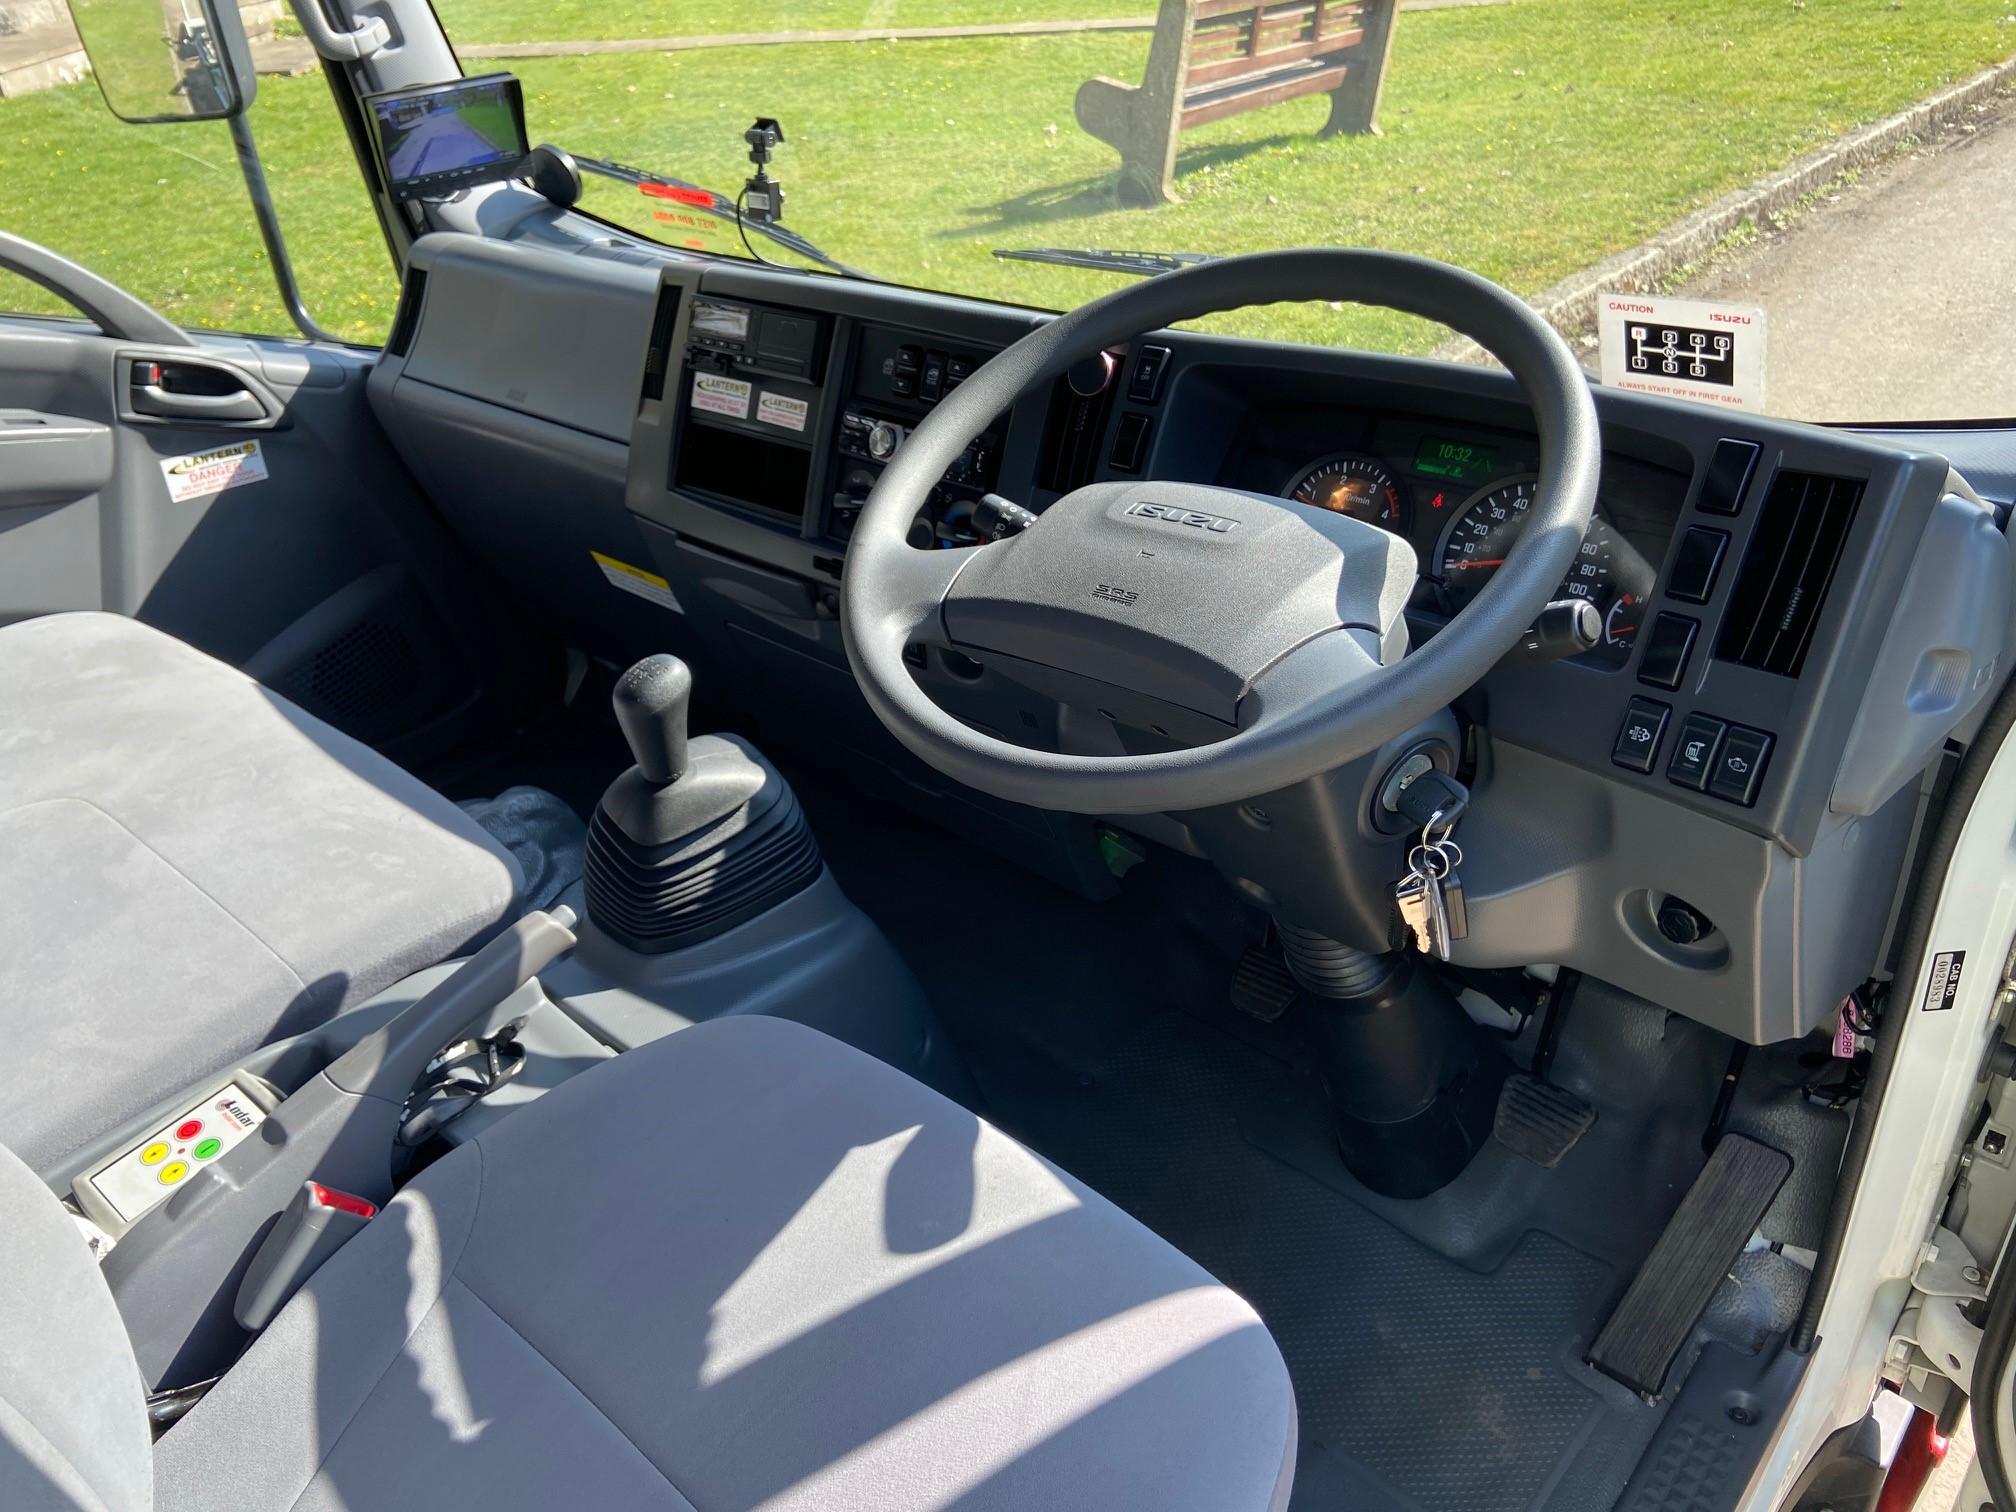 2021 '21' Isuzu N75.190 Crew Cab (Manual) Euro 6